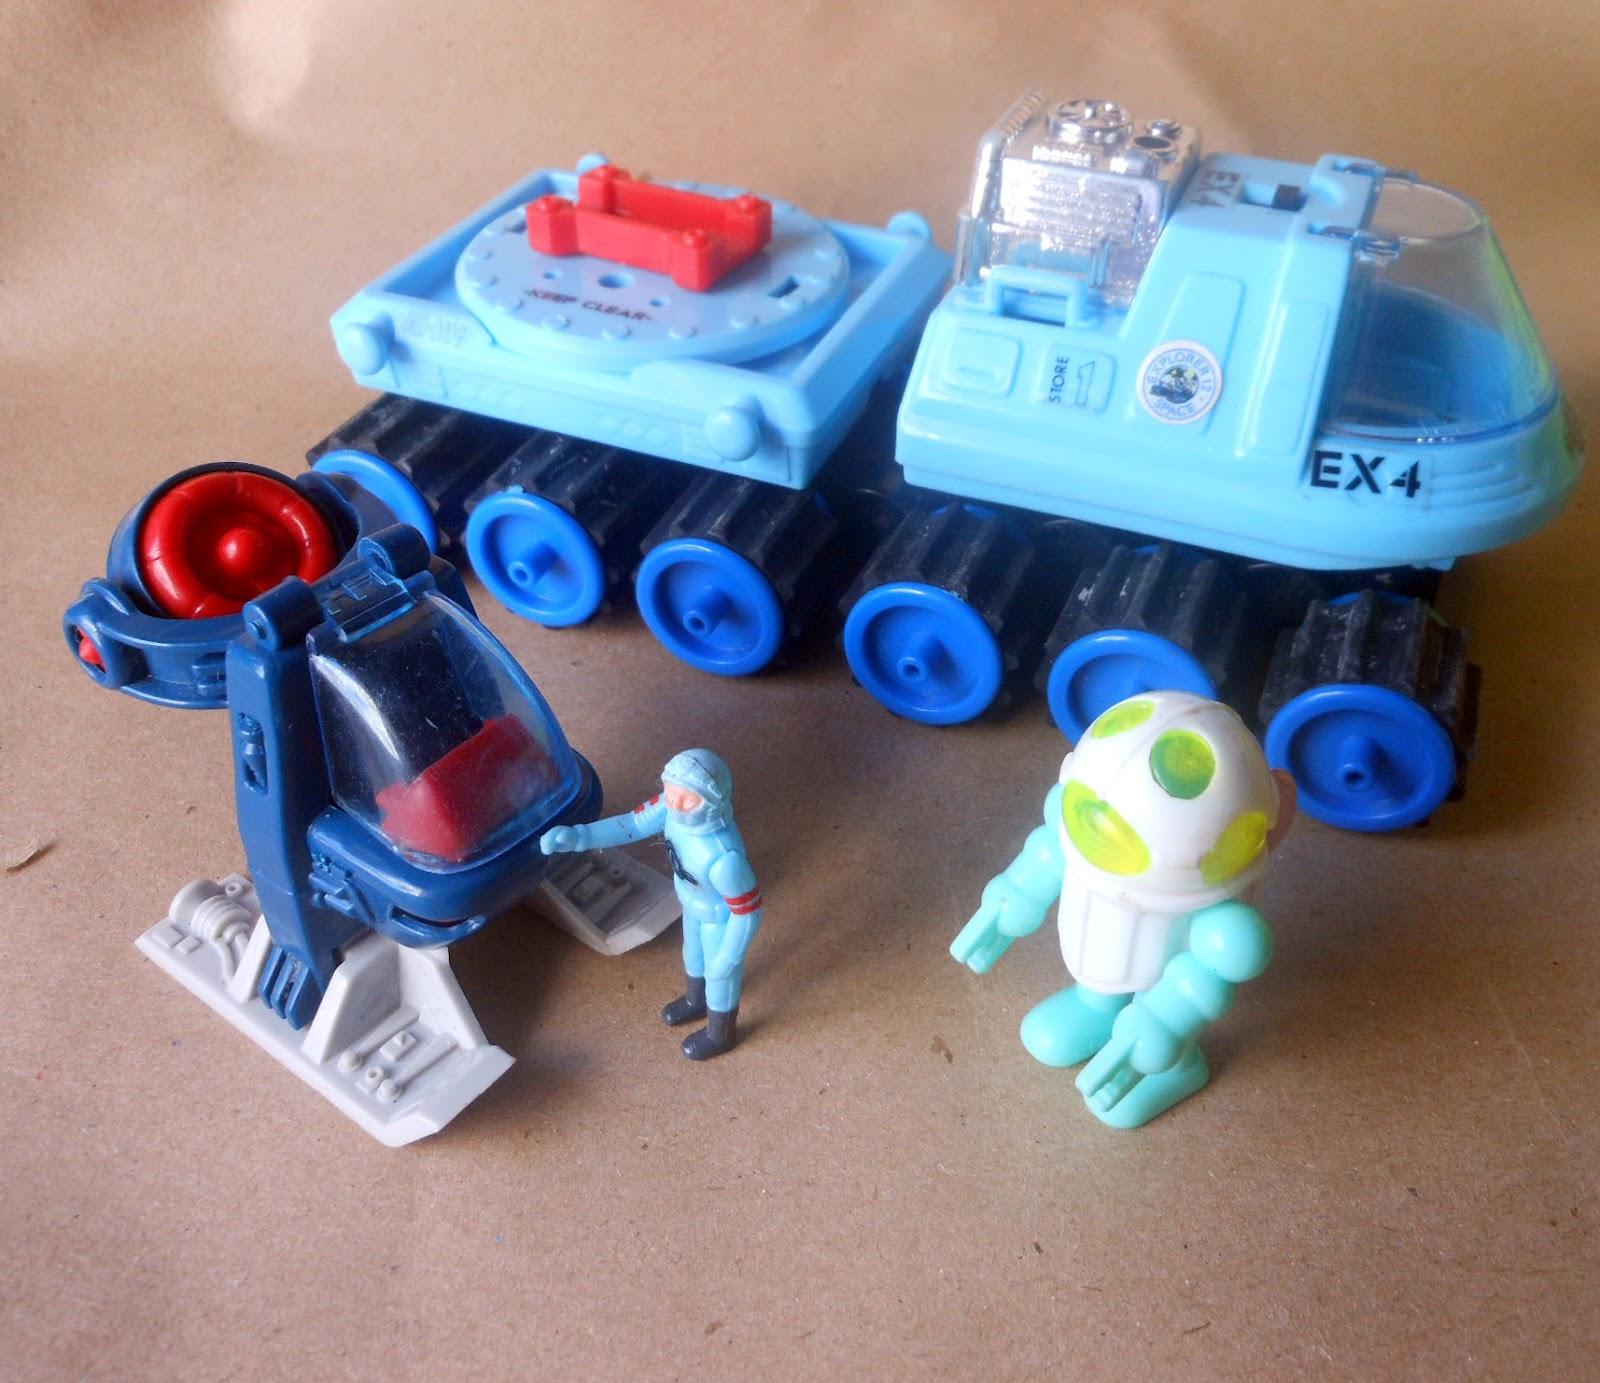 Manta Force Toys Helijet From Manta Force